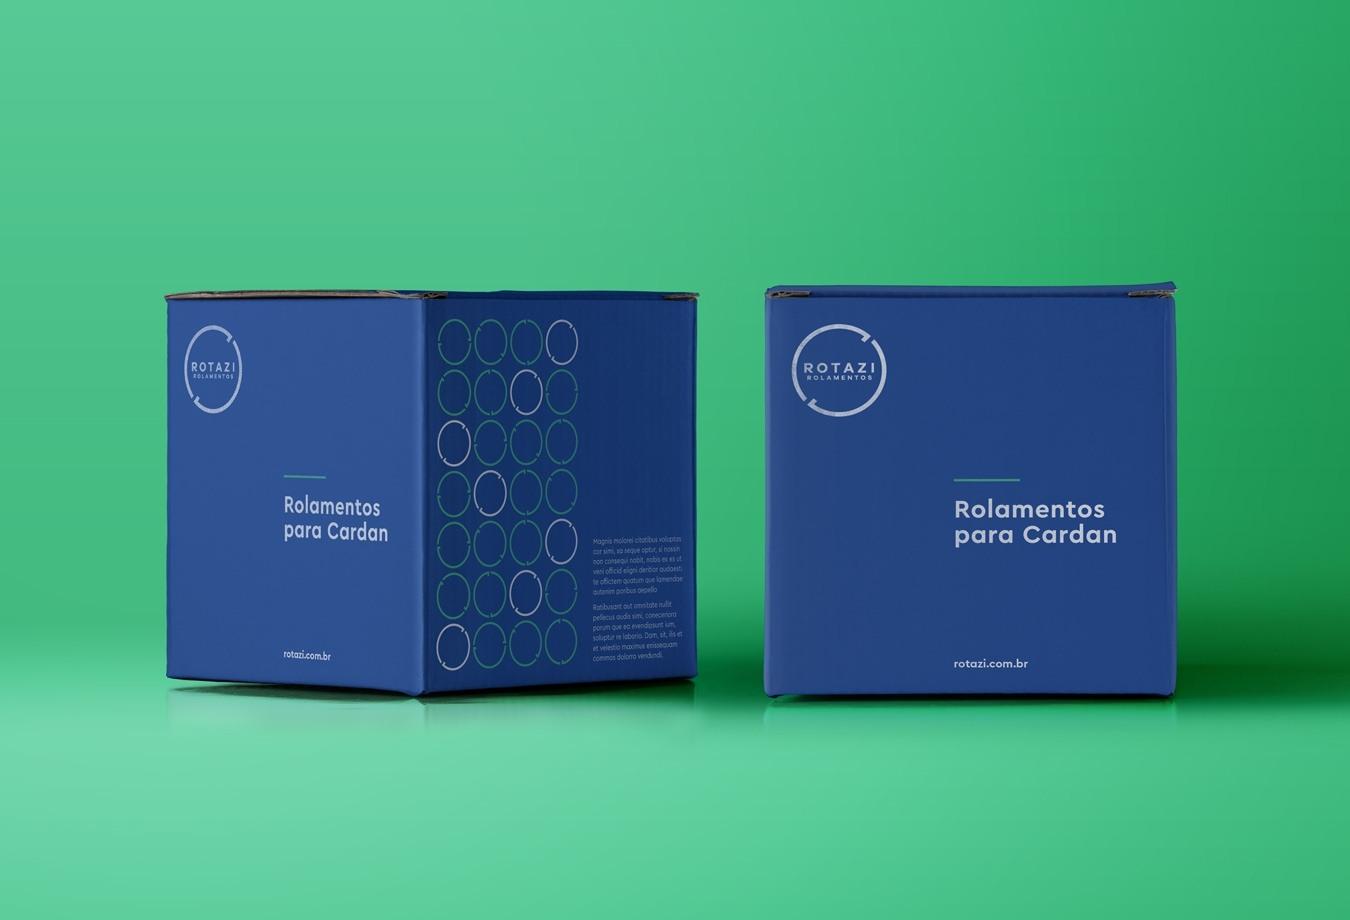 rotazi-identity-09-boxes